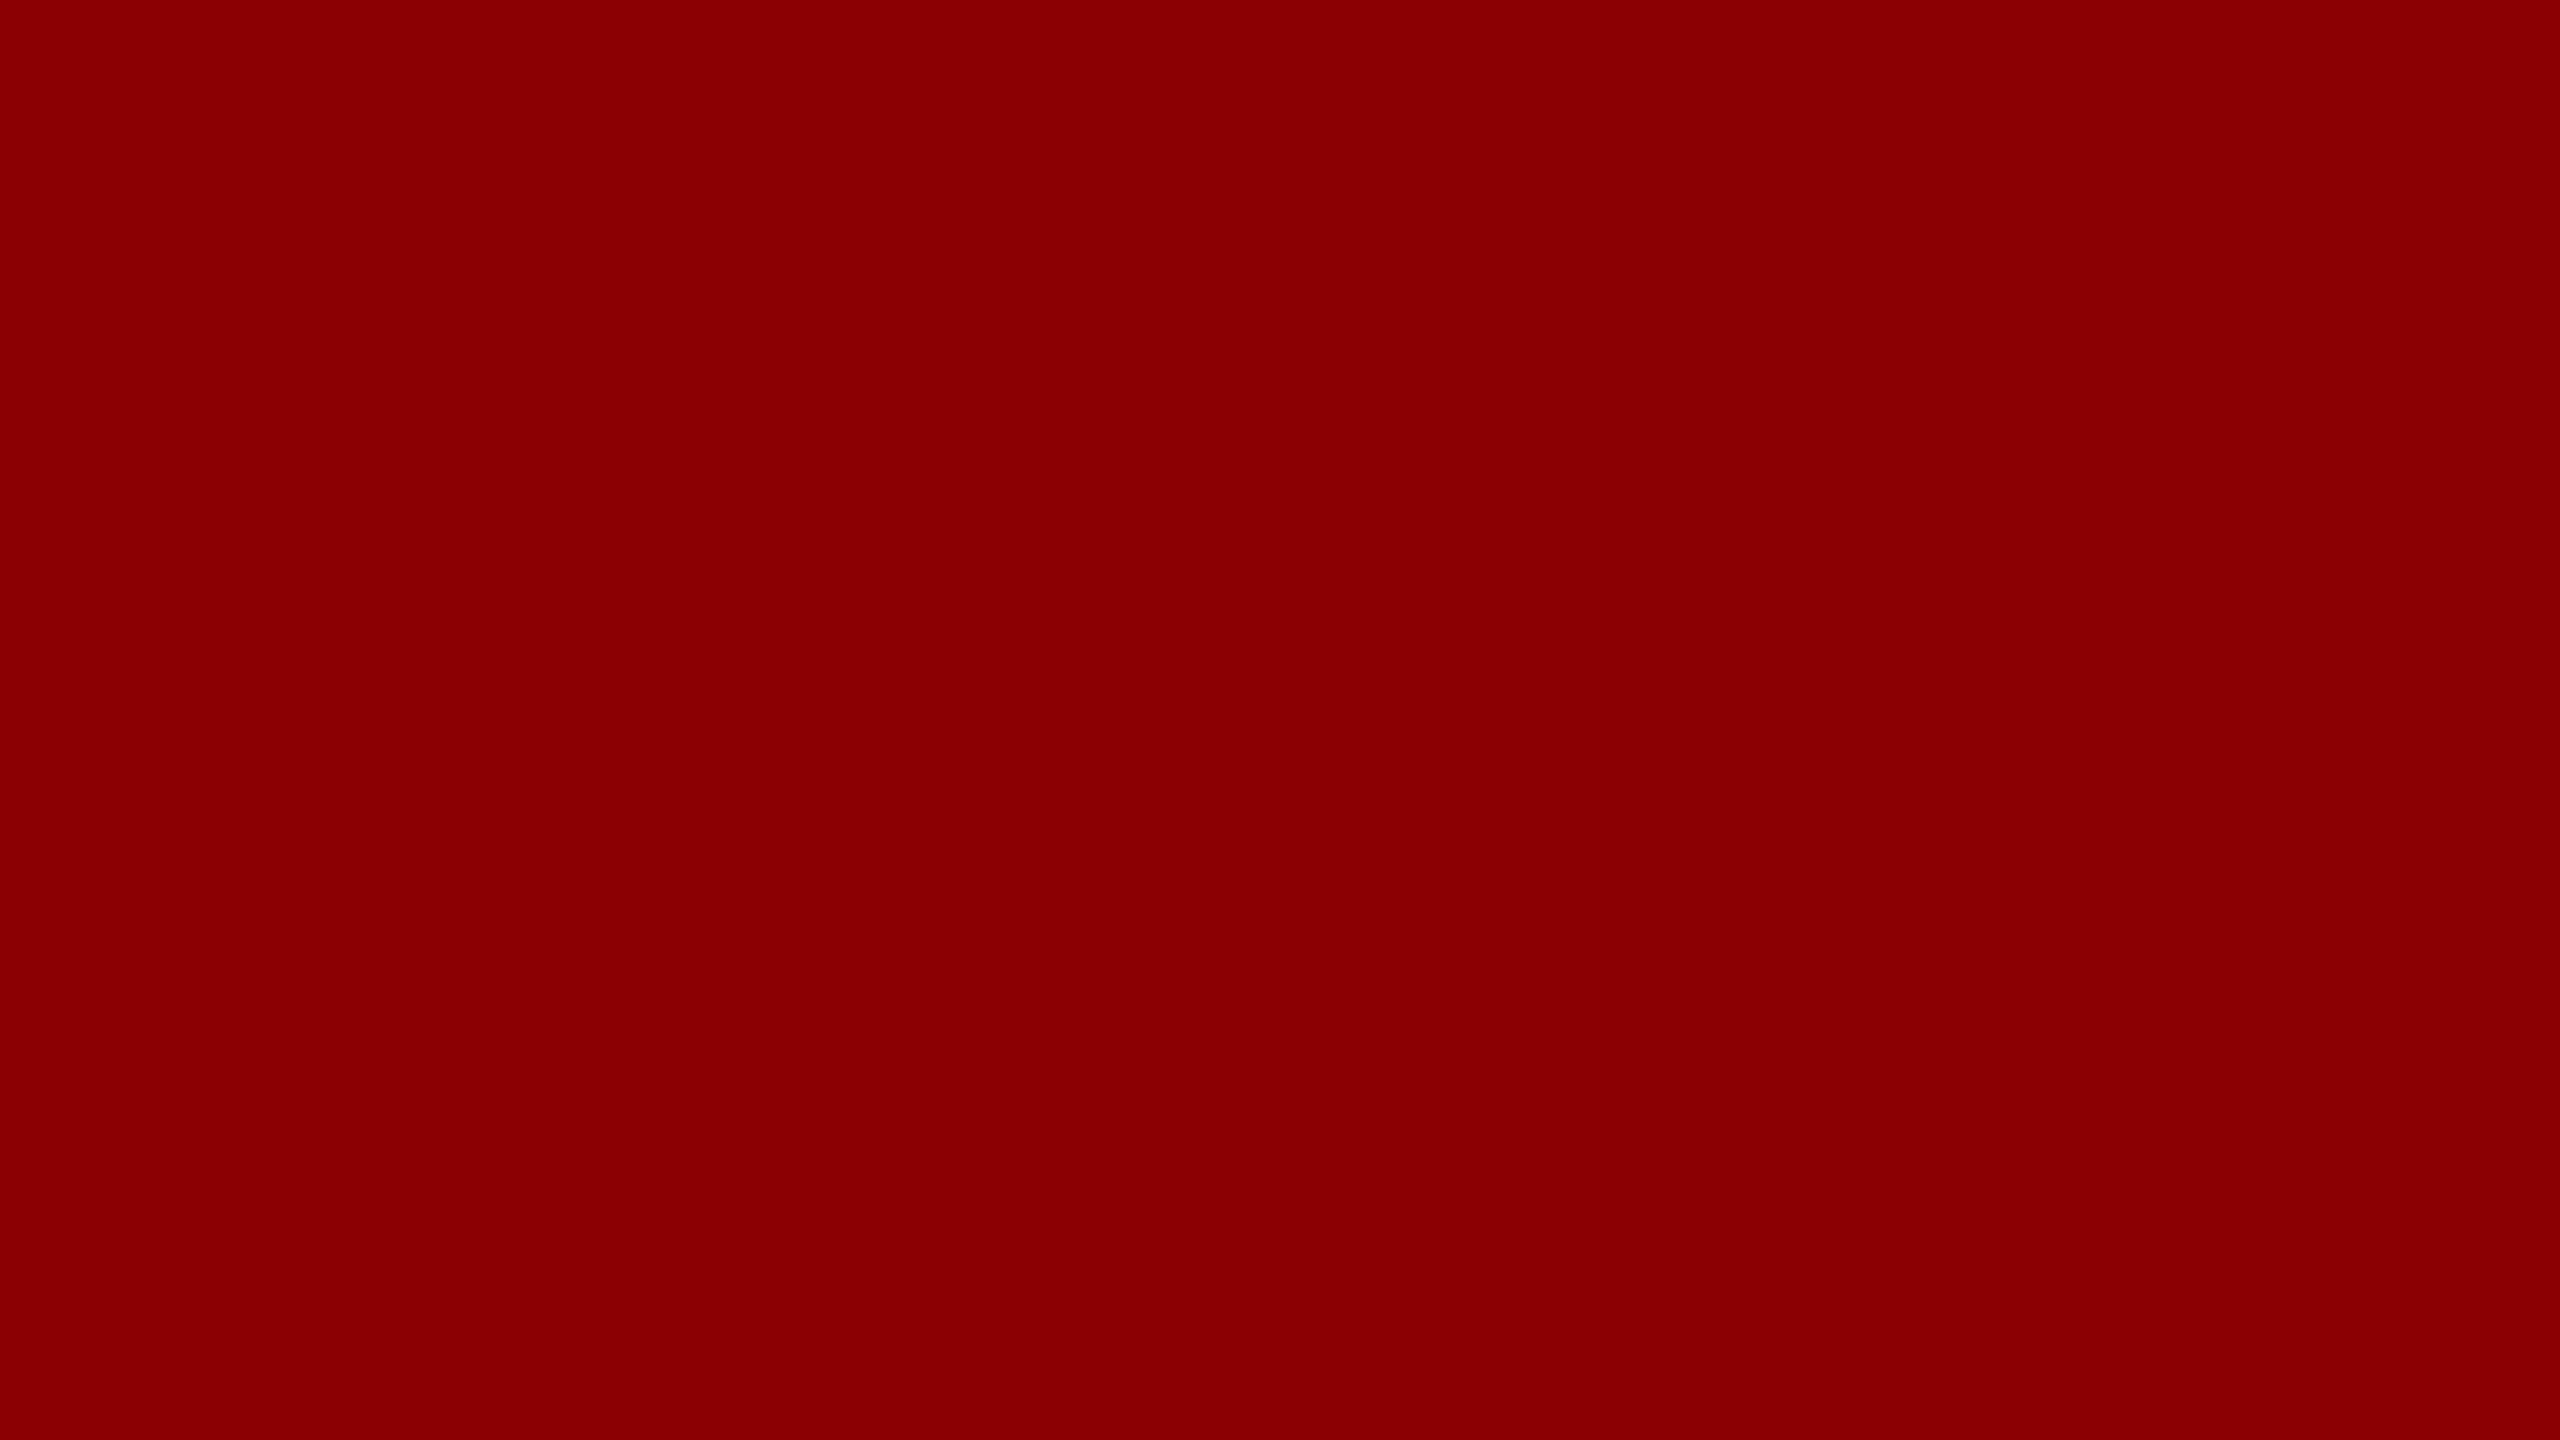 Dark Red Solid Color Background